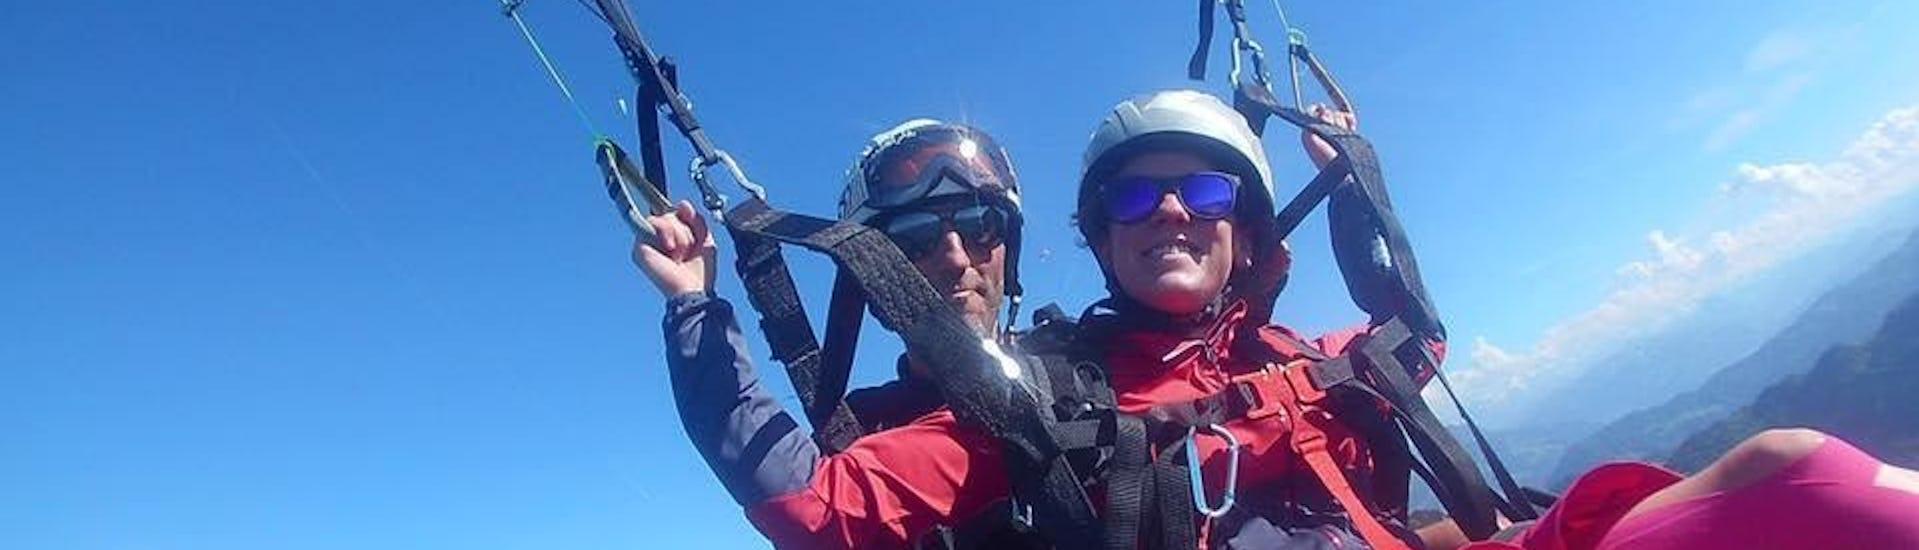 Tandem Paragliding in Kössen - Erlebnisflug